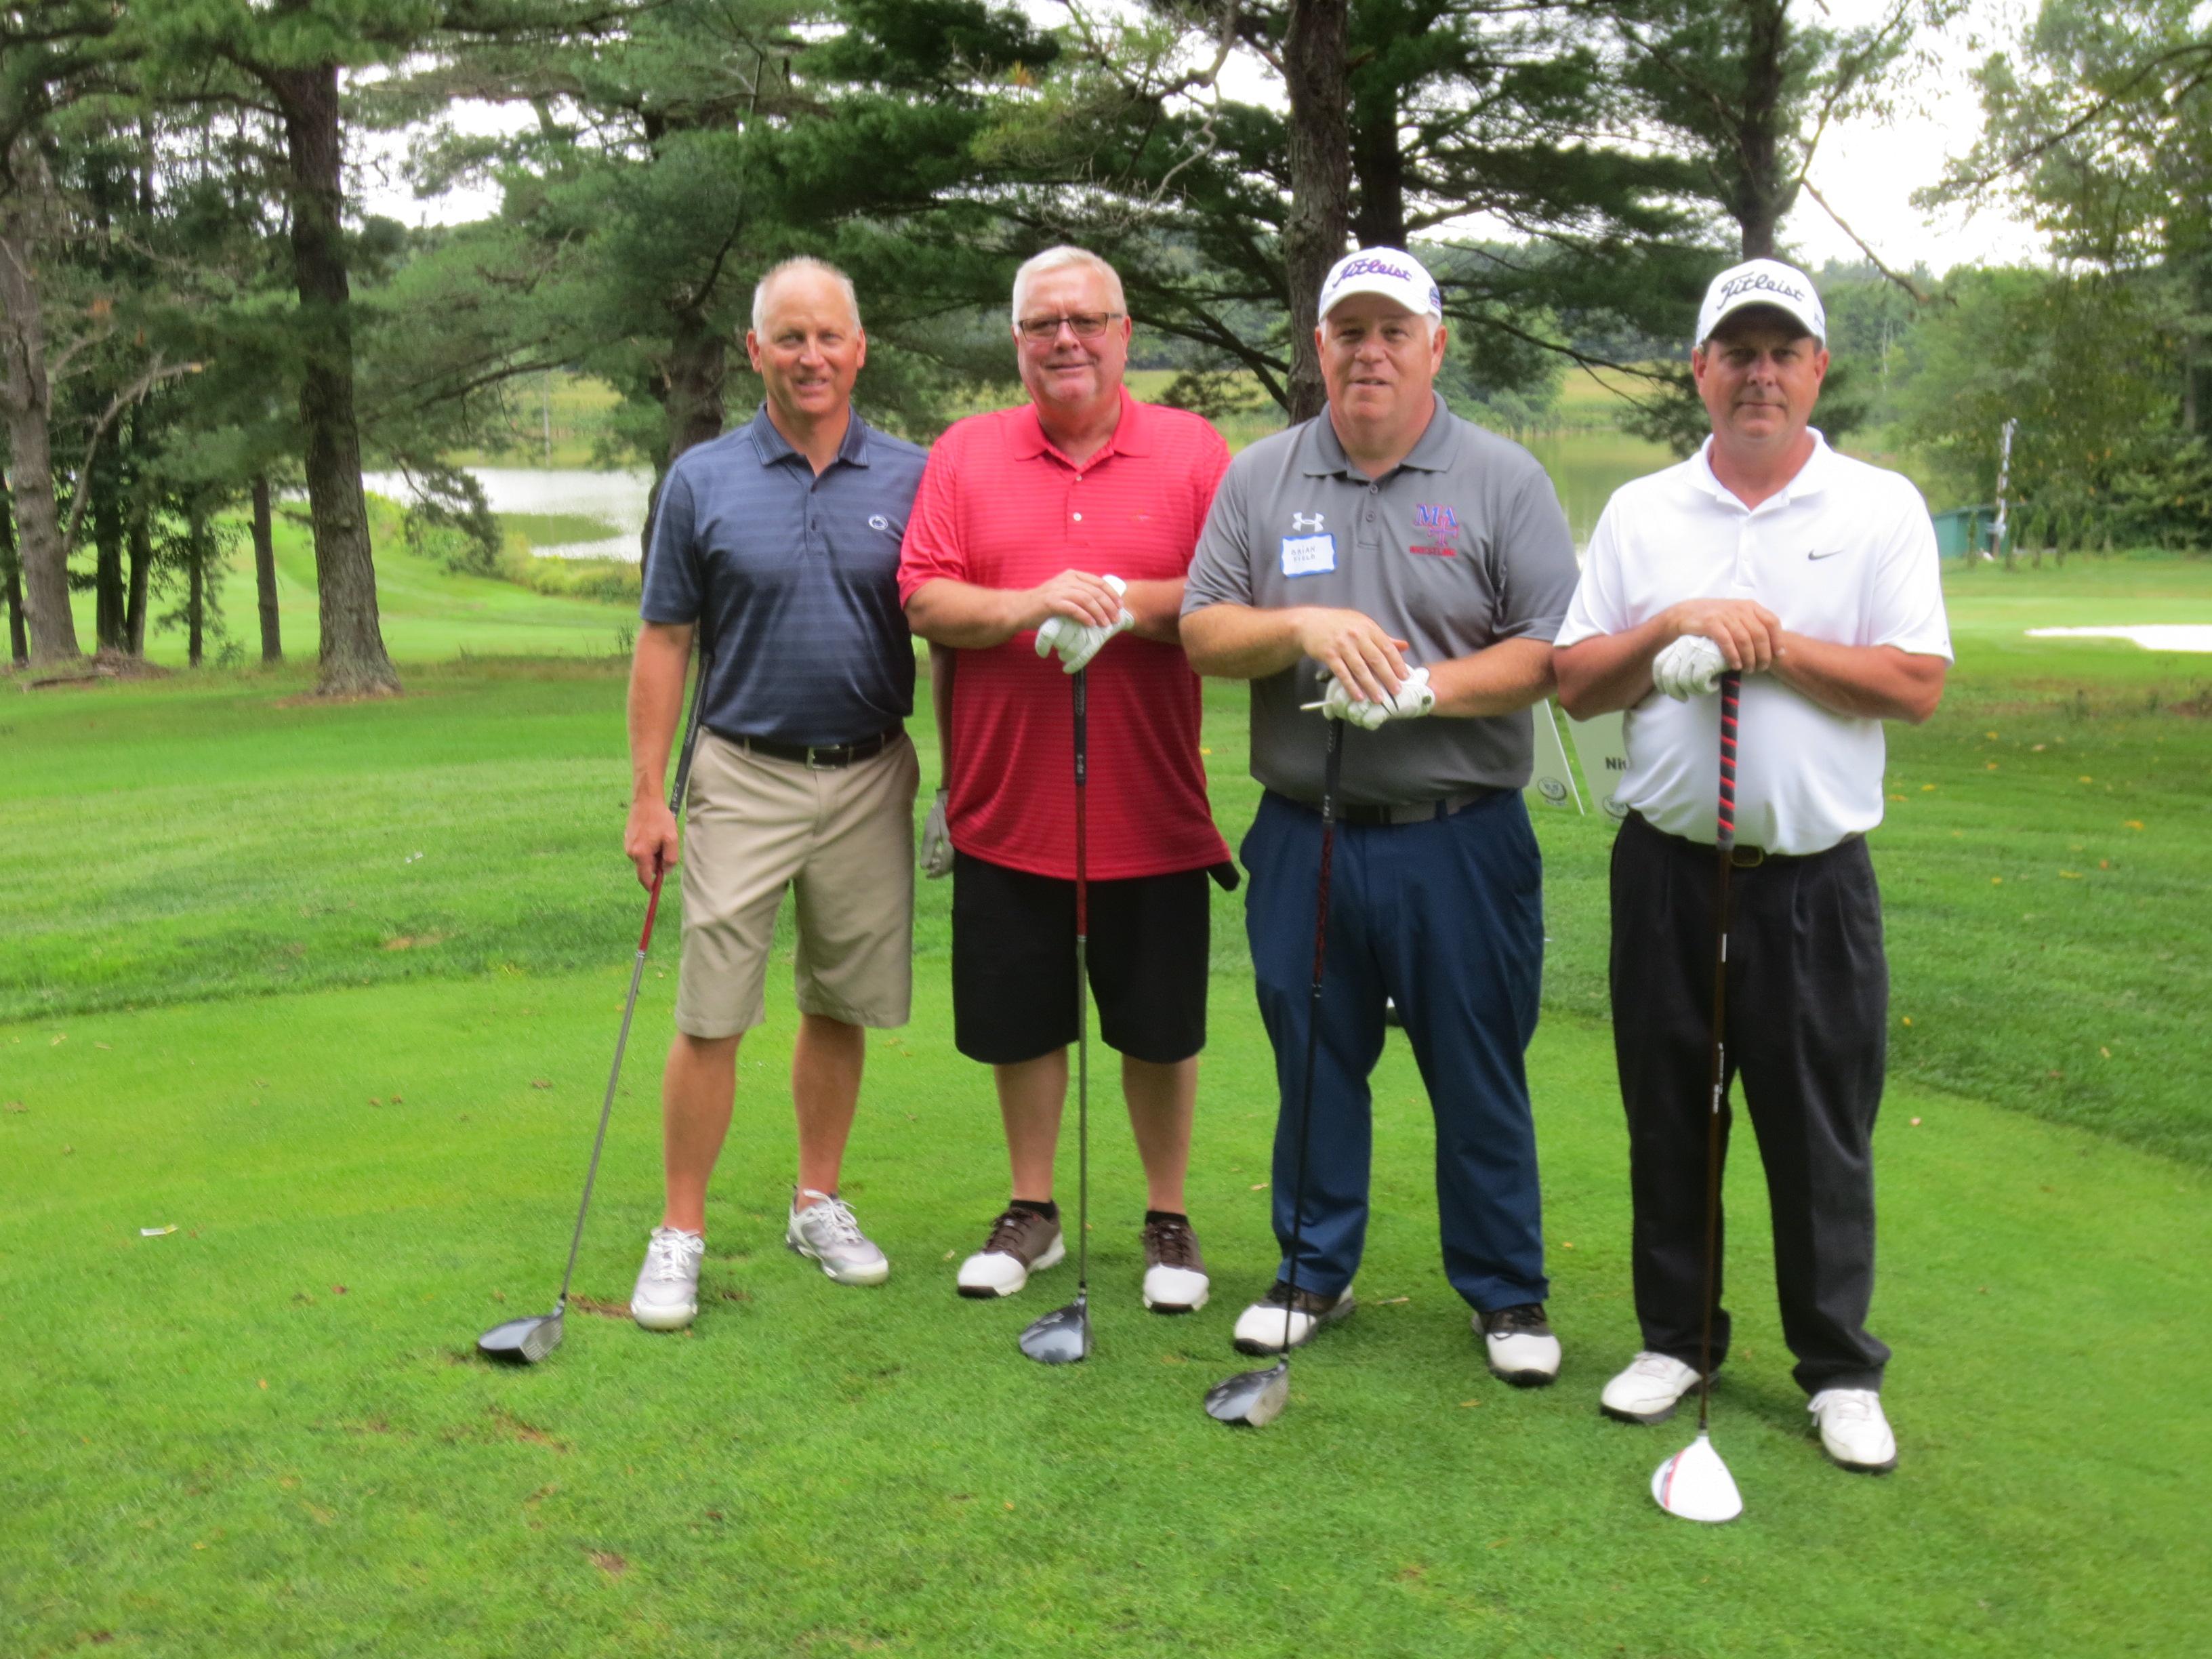 Brad McGil, Gary Black, Brian Field, Tom Cawlkins